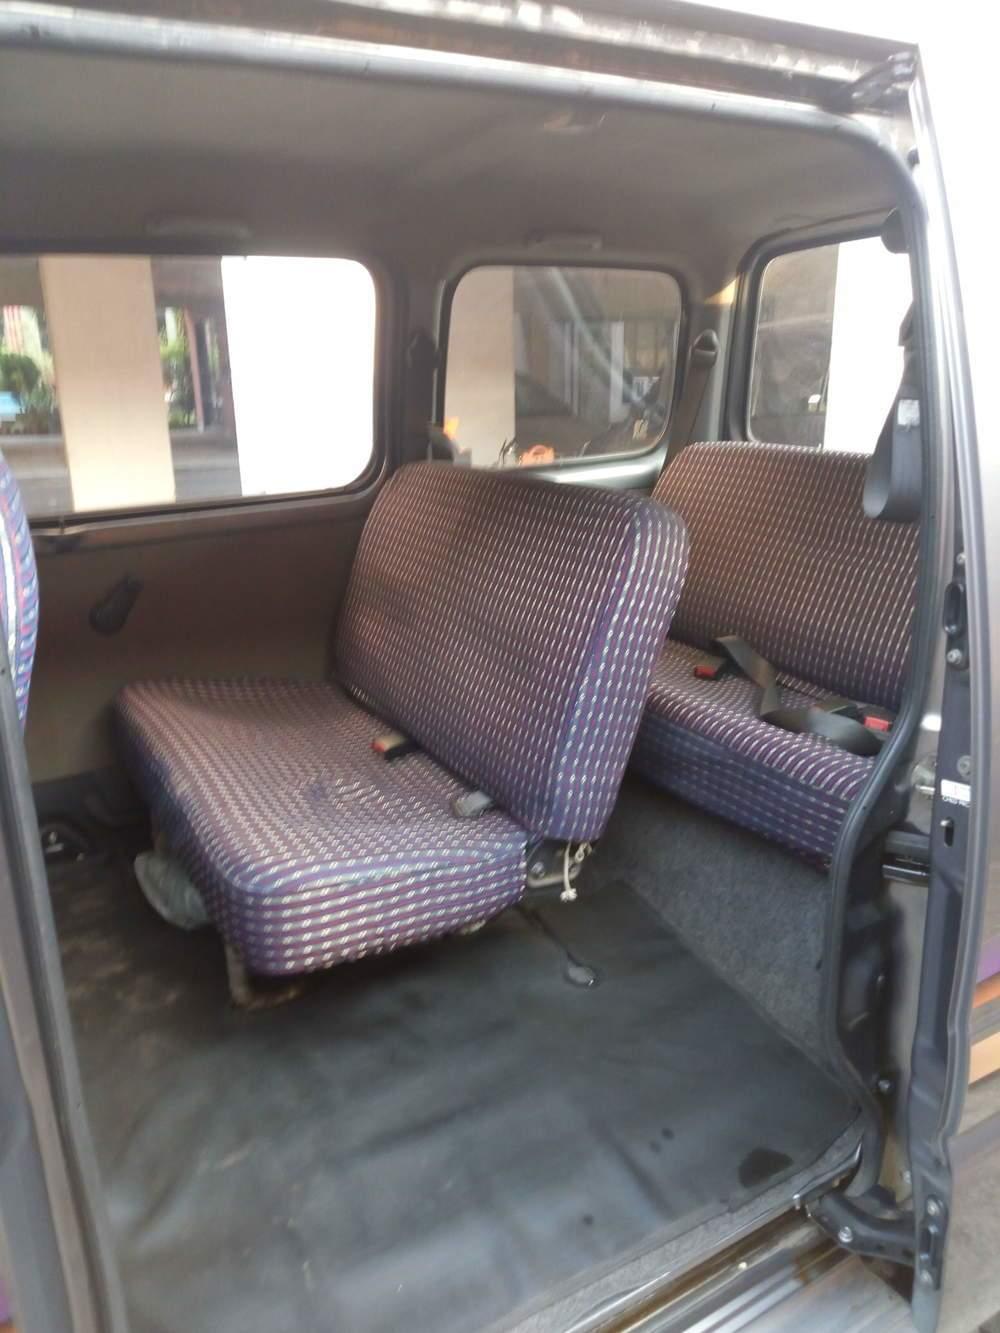 Used Maruti Suzuki Eeco 7 Seater In South 24 Parganas 2011 Model